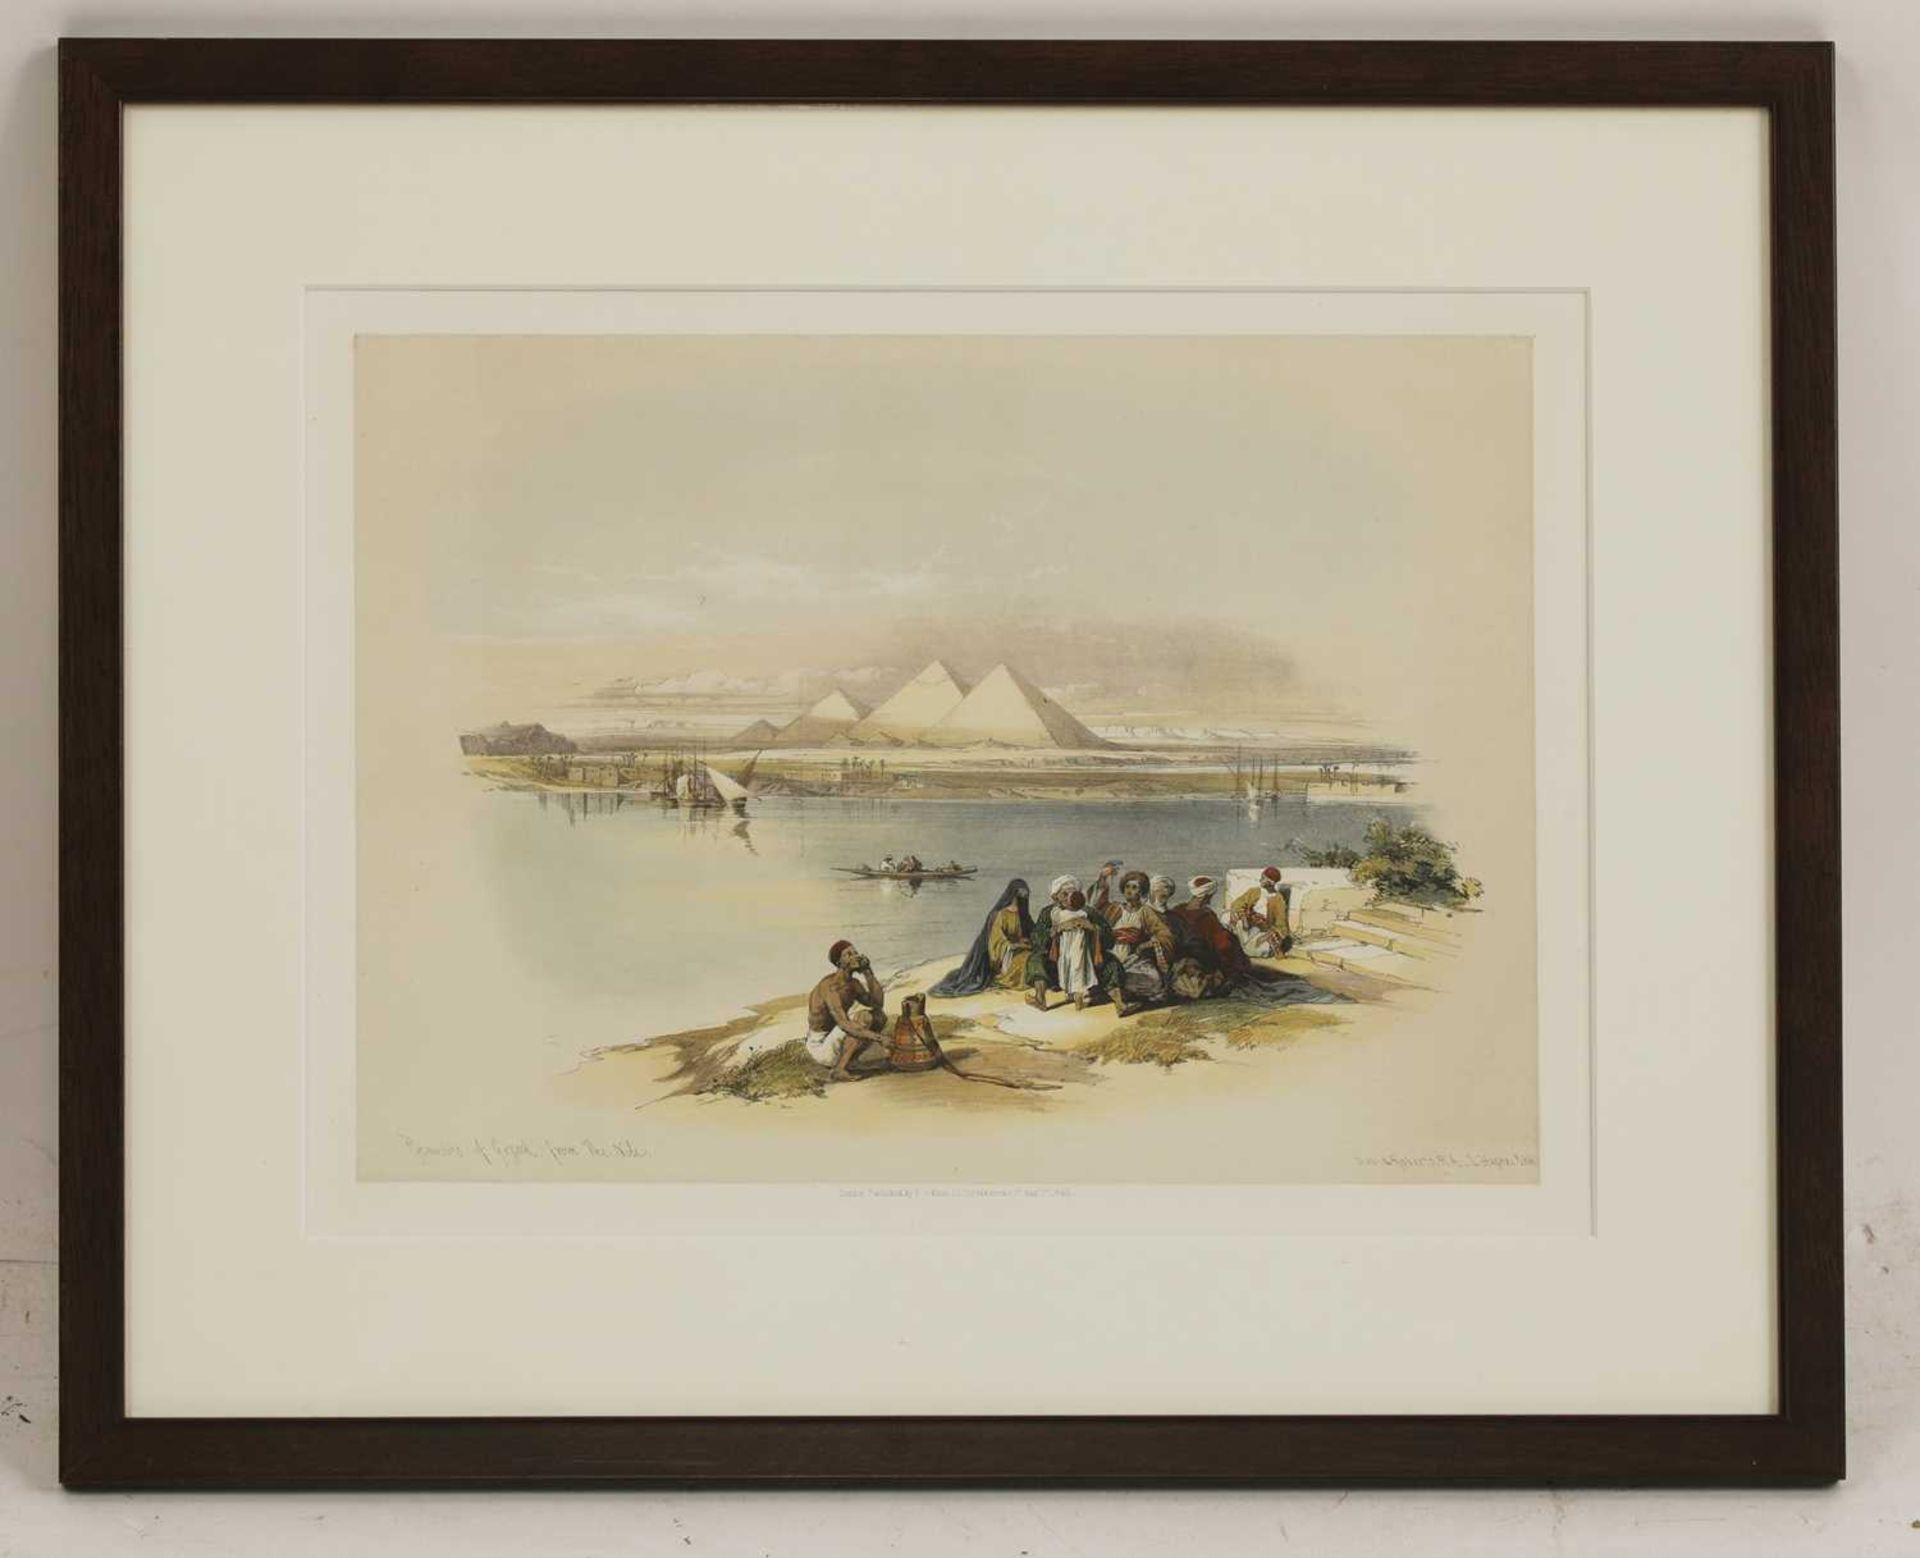 Louis Haghe after David Roberts RA (1796-1864) - Image 18 of 20